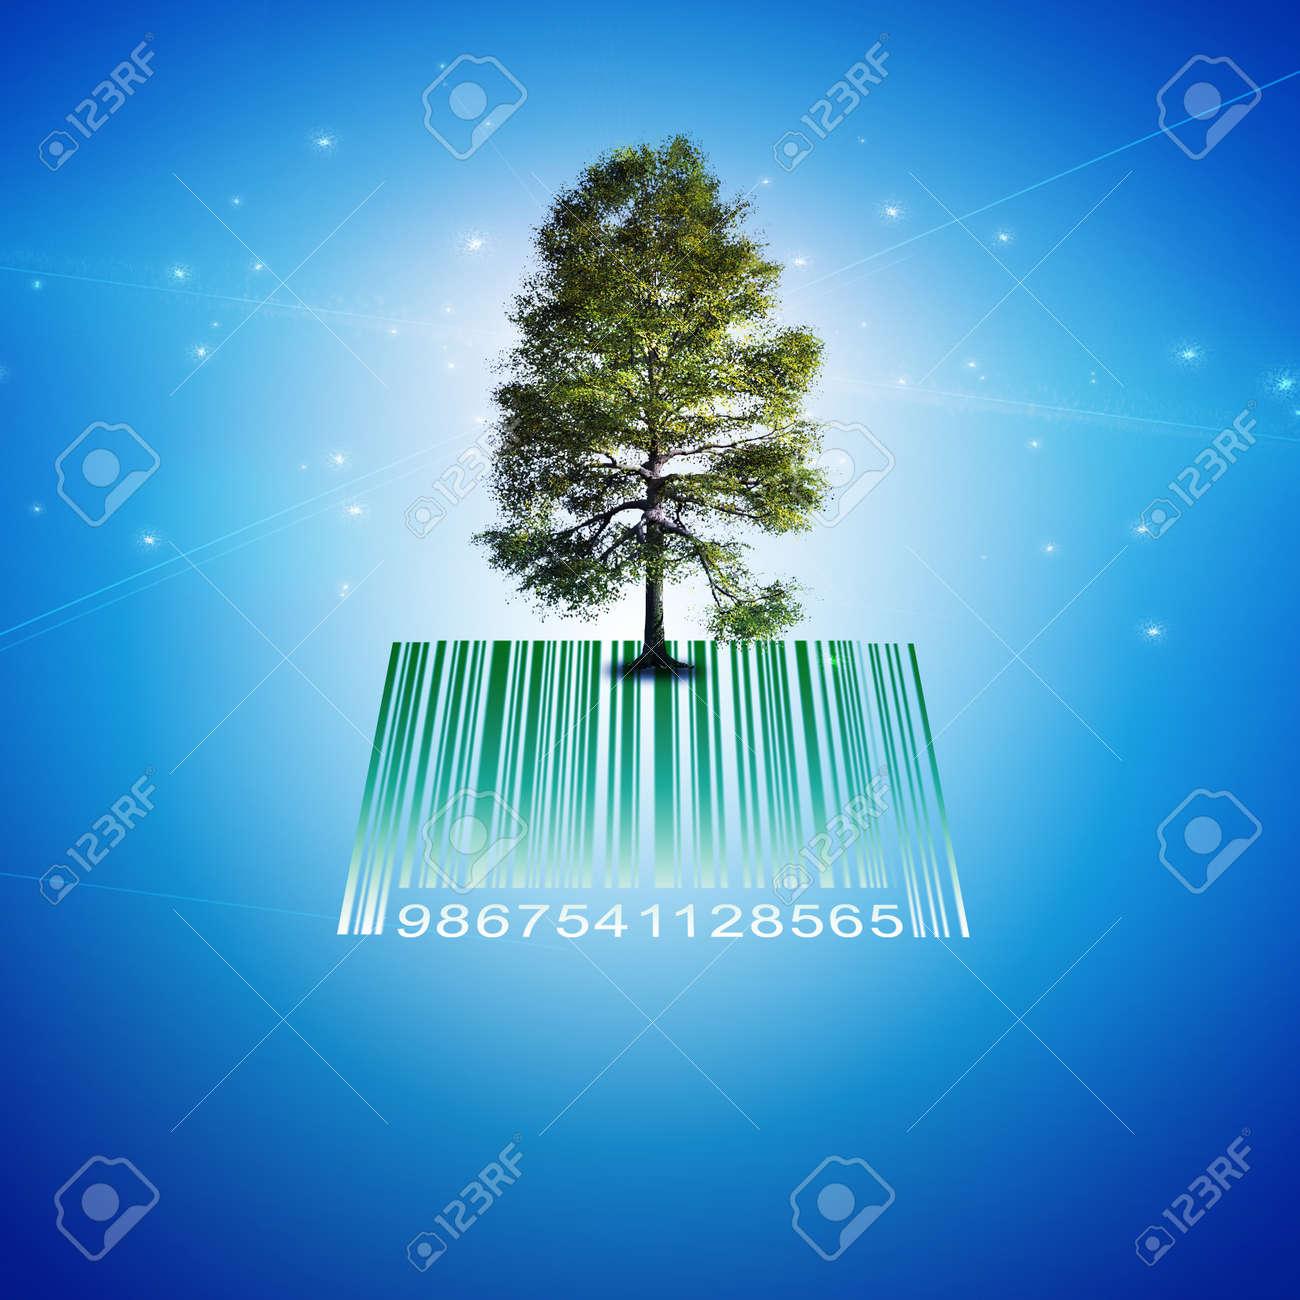 Barcode Tree Stock Photo - 15922566